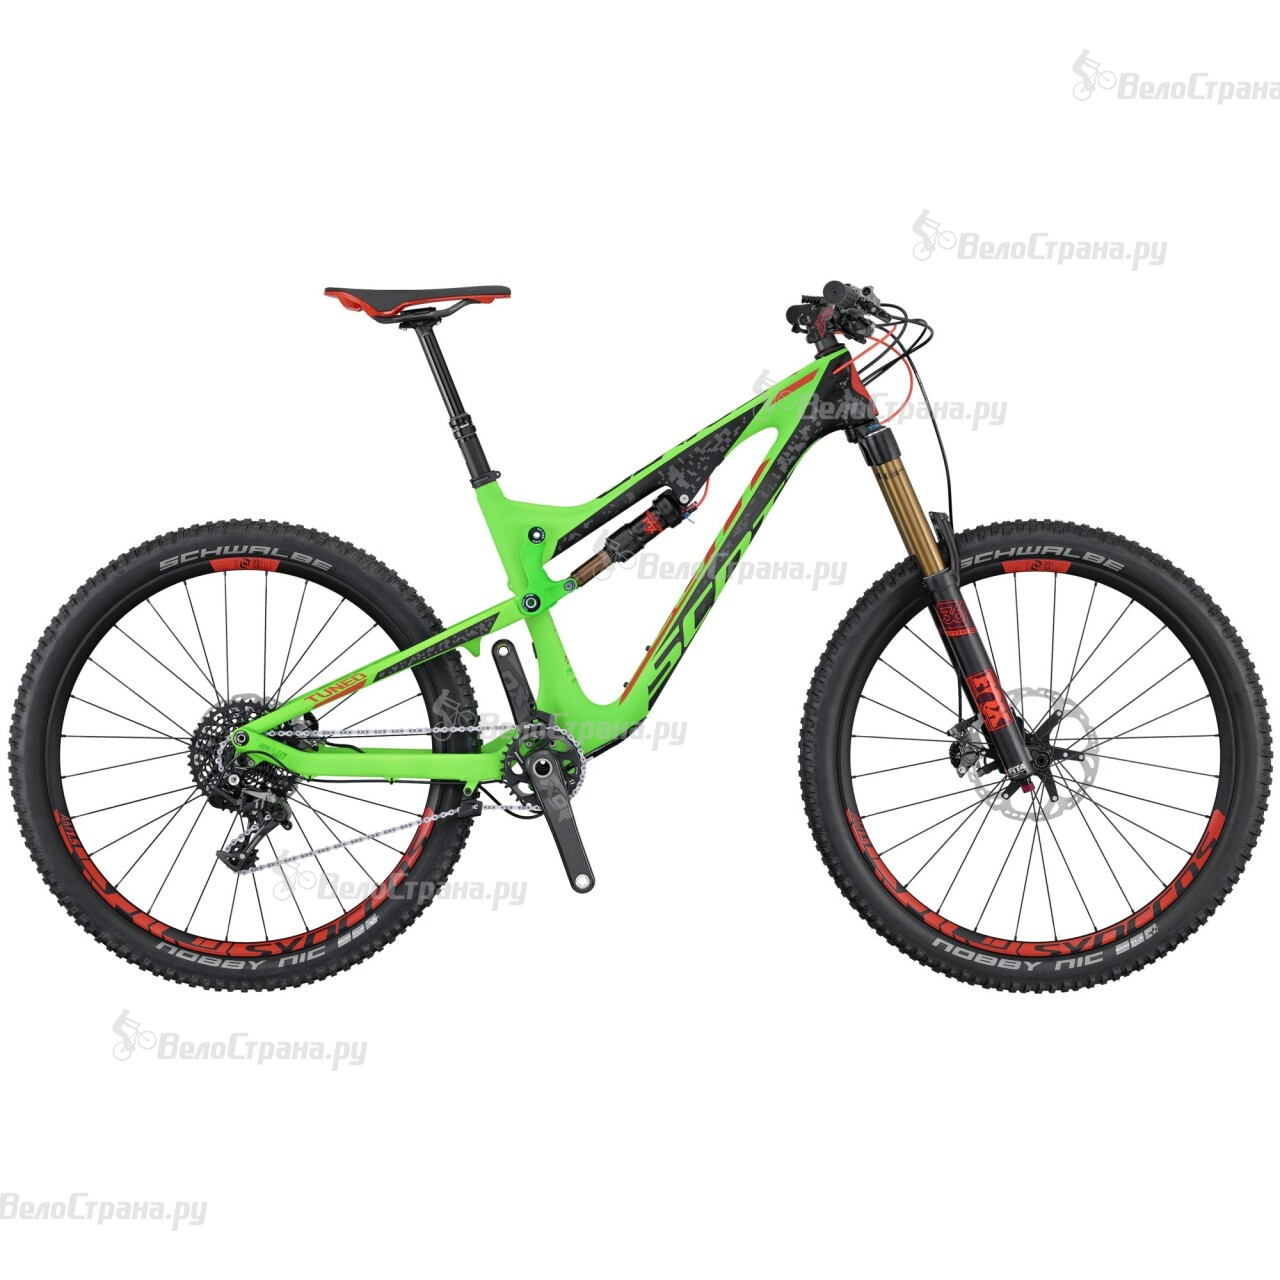 Велосипед Scott Genius LT 700 Tuned (2016) велосипед scott genius lt 700 tuned plus 2016